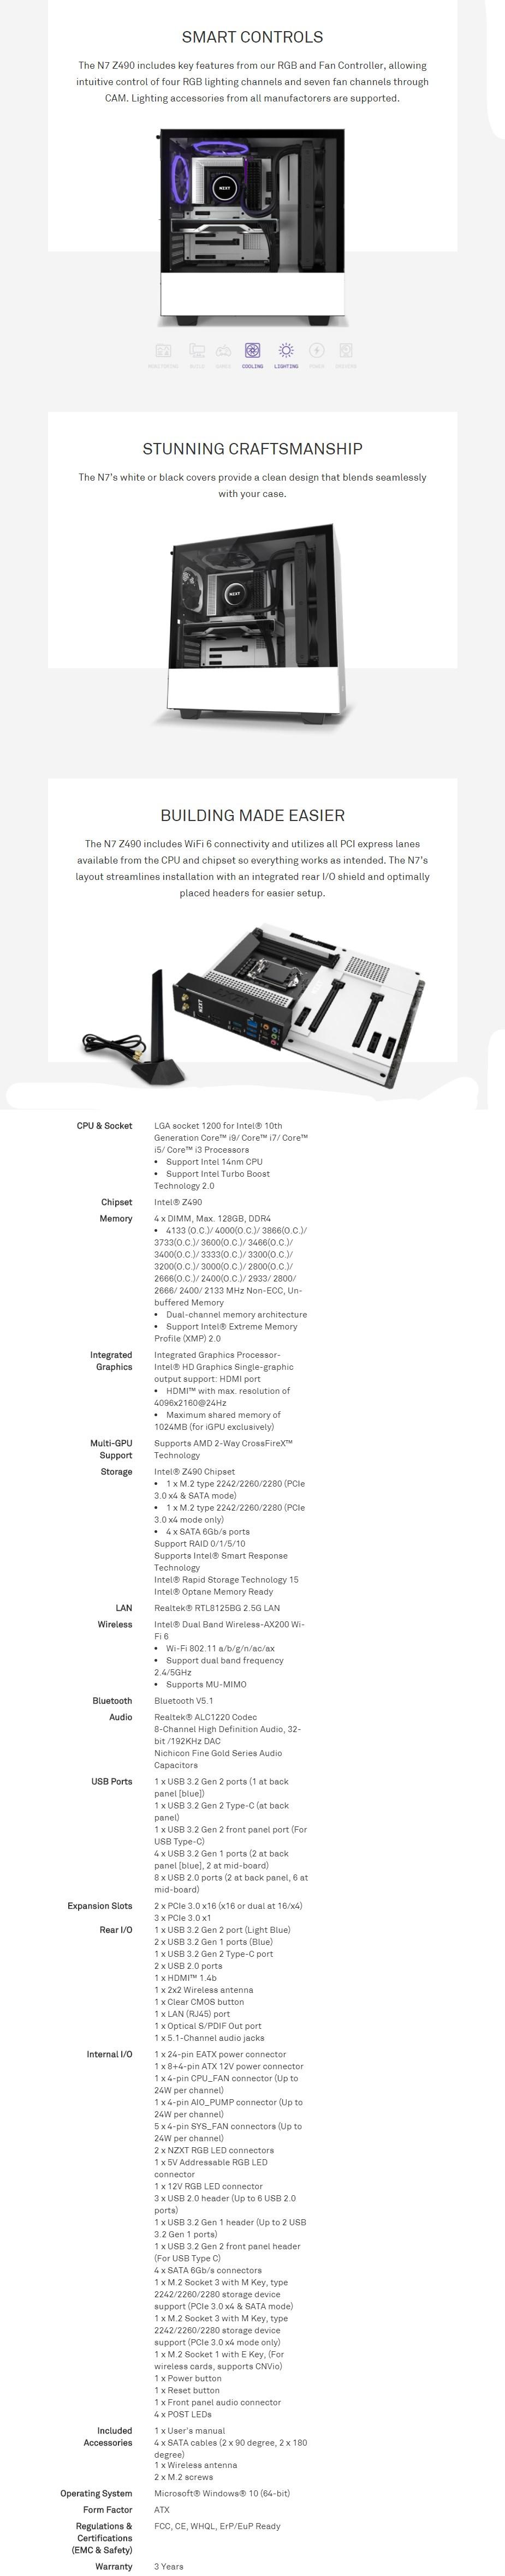 NZXT N7 Z490 Gaming Intel LGA 1200 ATX Motherboard - Matte Black - Desktop Overview 1